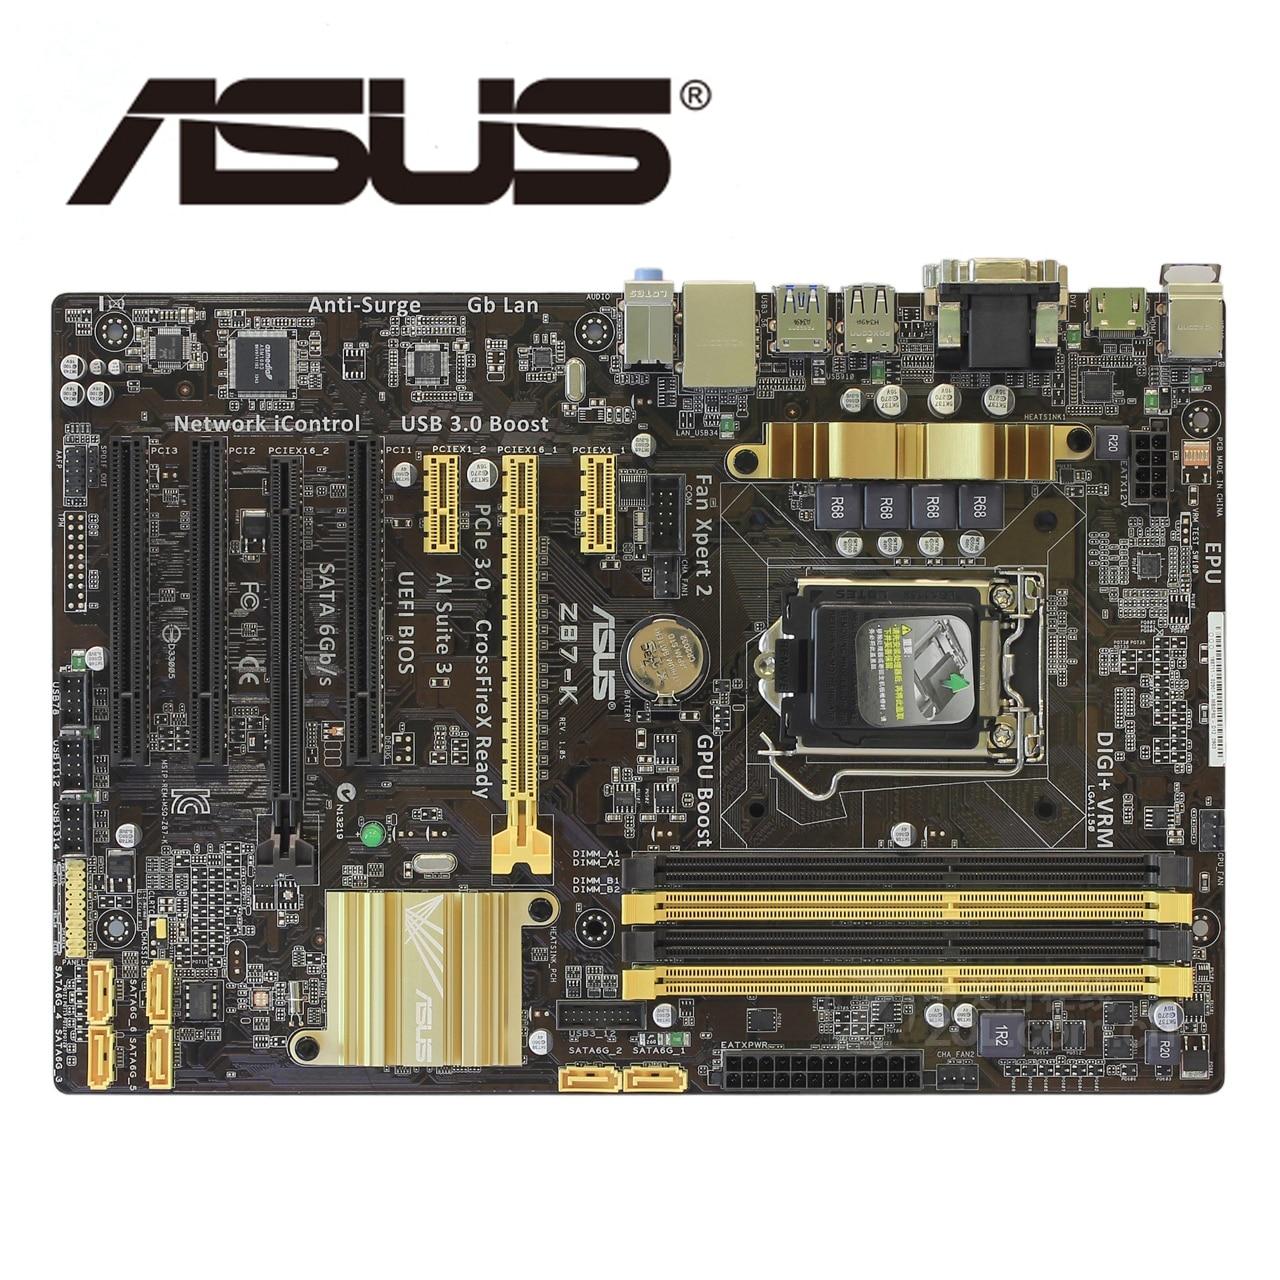 LGA 1150 DDR3 Z87 для ASUS Z87-k оригинальная материнская плата 32G Z87K настольная материнская плата USB3.0 SATA III VGA OC б/у